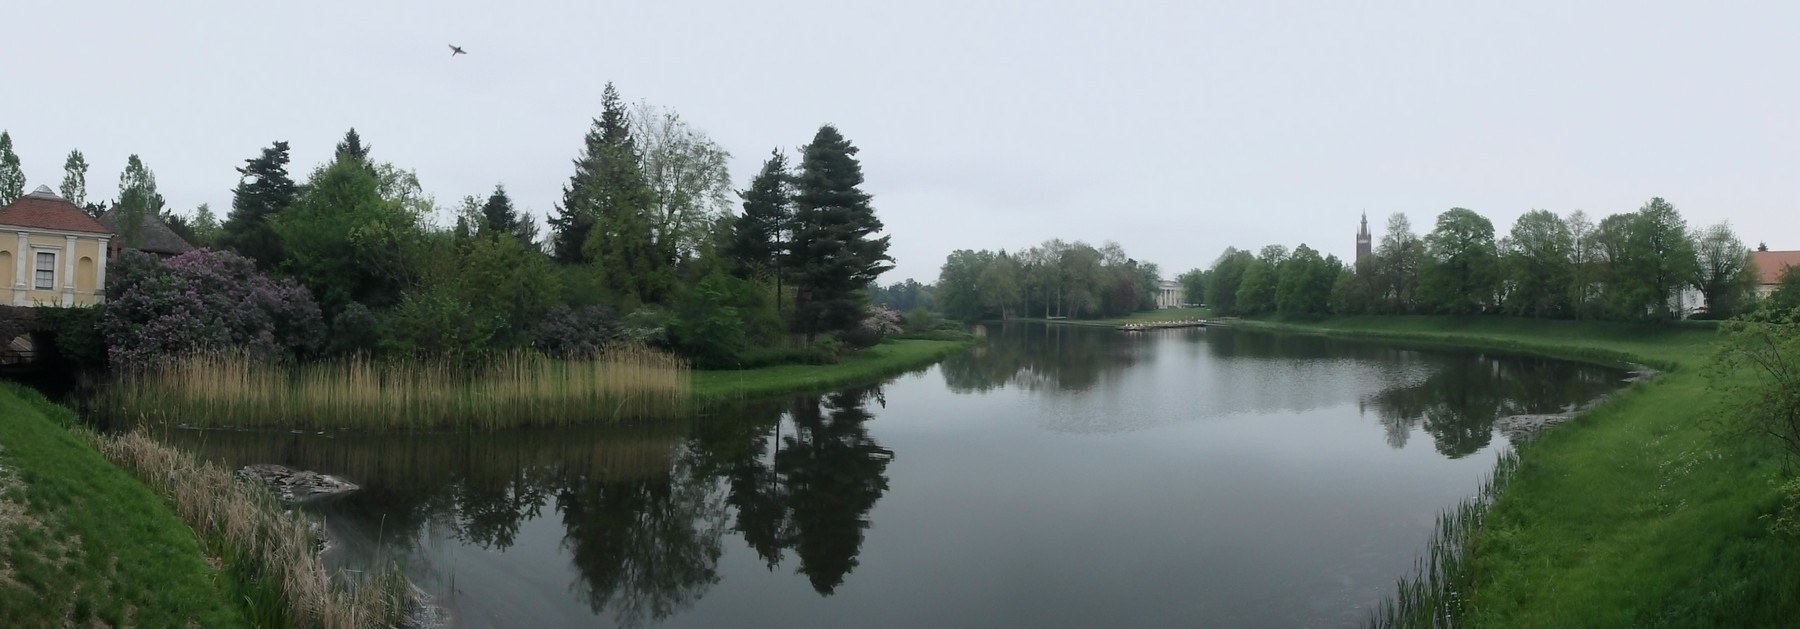 P4240121 Pano Reino de los jardines de Dessau-Wörlitz